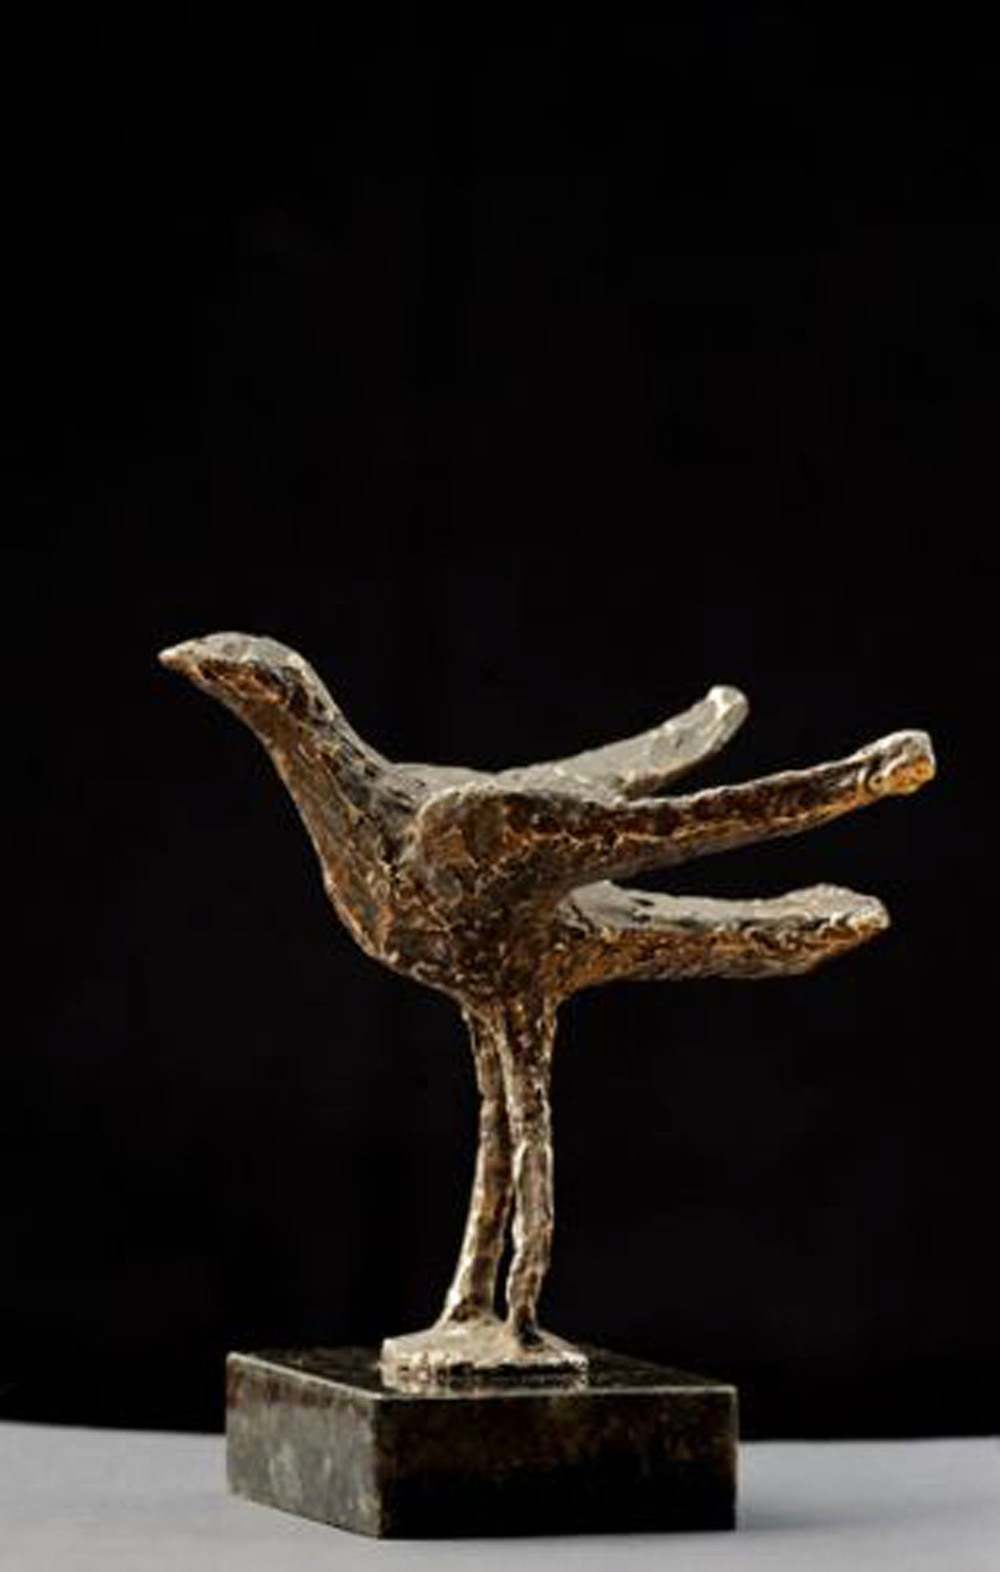 Breon O'Casey_Small Winged Bird_47.5 x 55cm.jpg